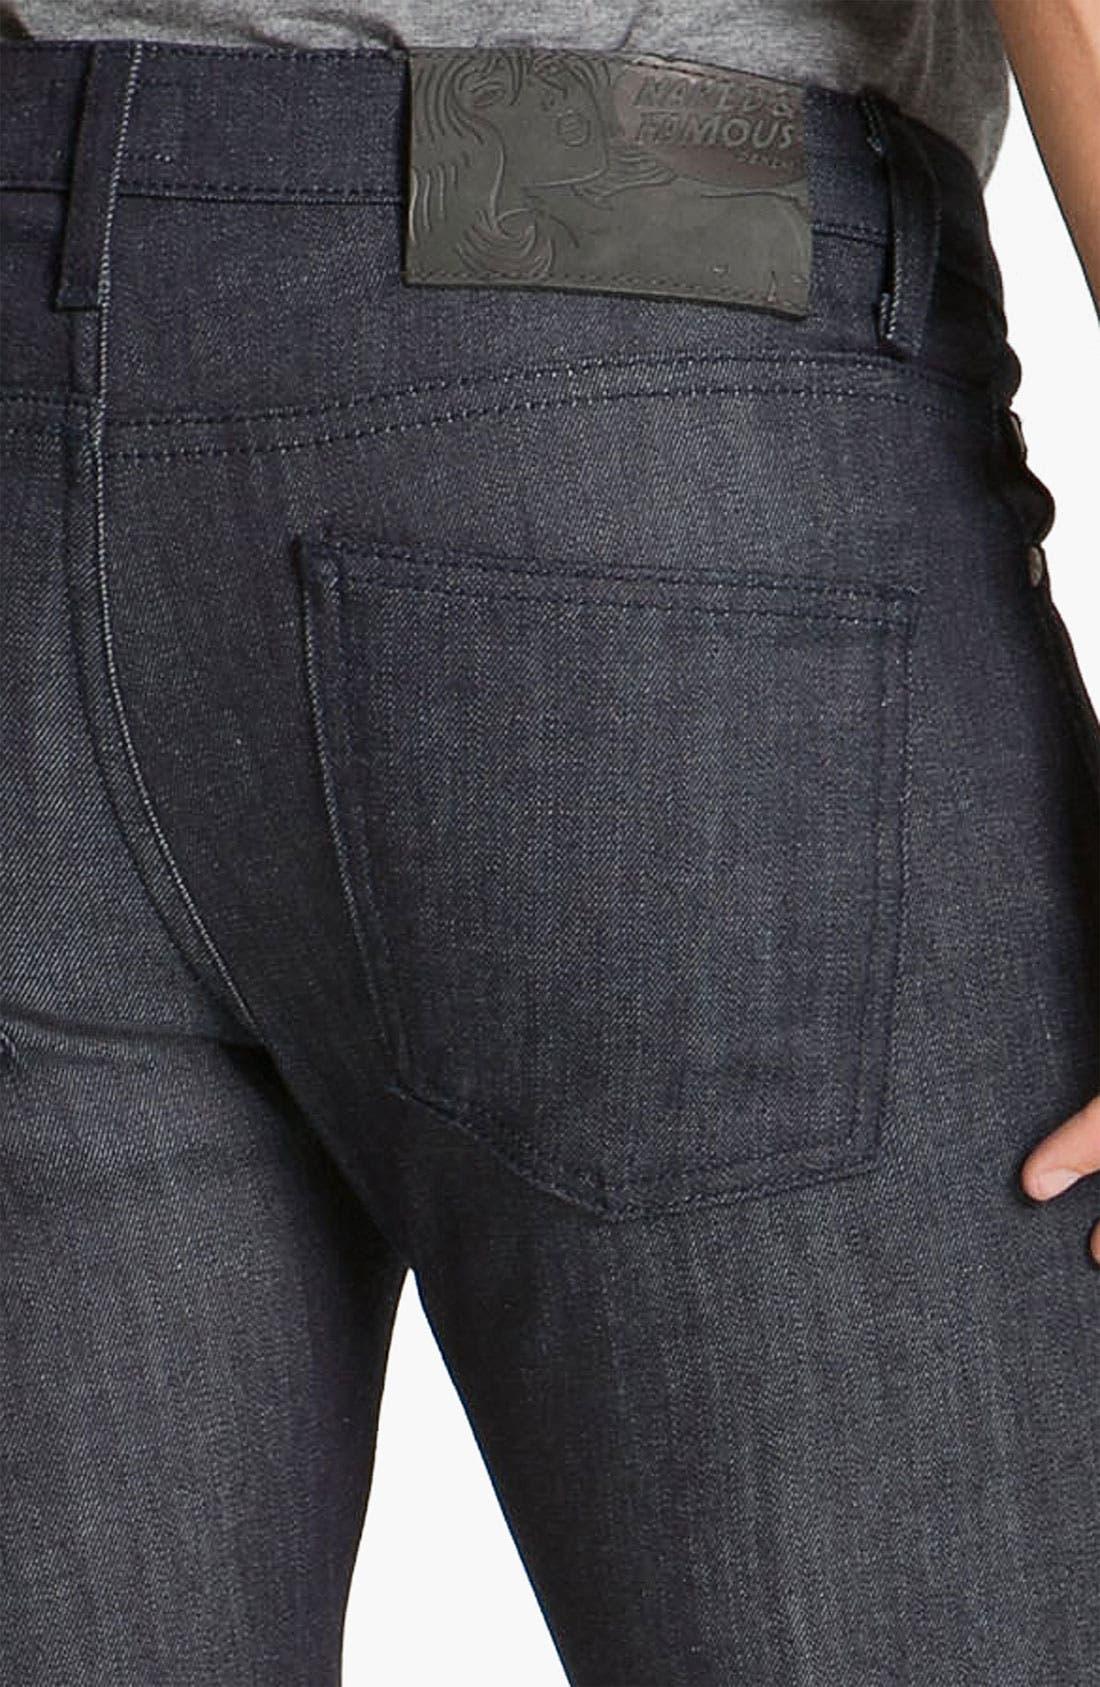 'Skinny Guy' Slim Cotton Cashmere Skinny Leg Jeans,                             Alternate thumbnail 2, color,                             400